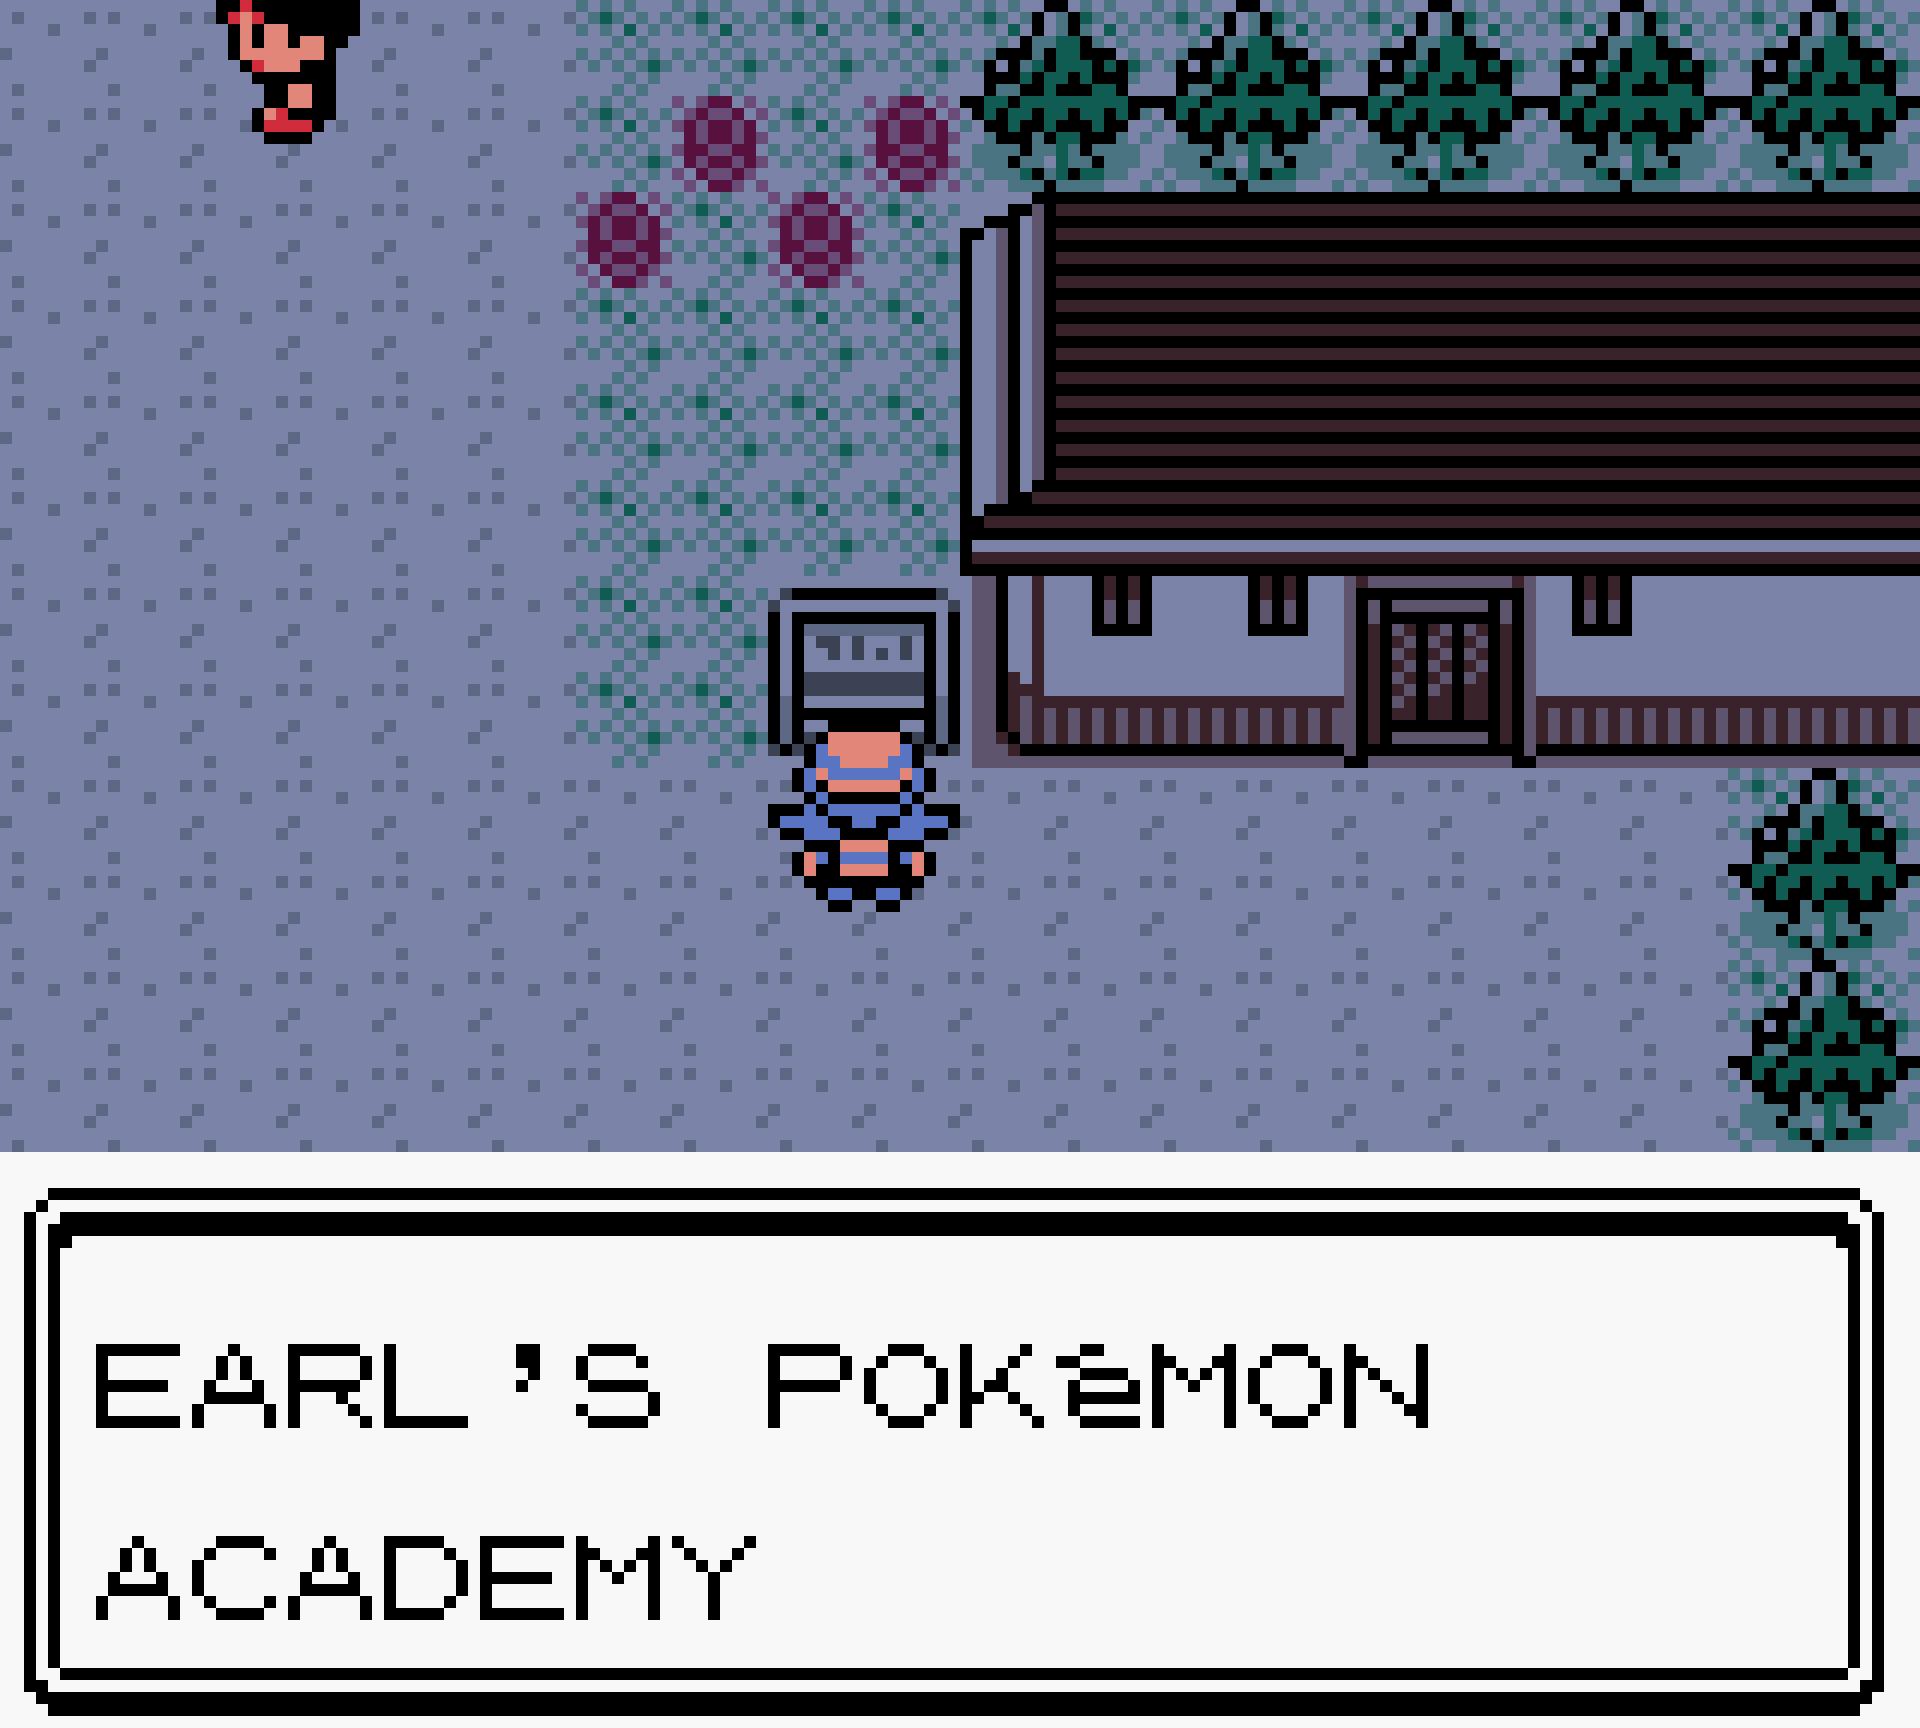 Pokemon_Crystal_Nuzlocke_2021-10-14_19.39.44.png